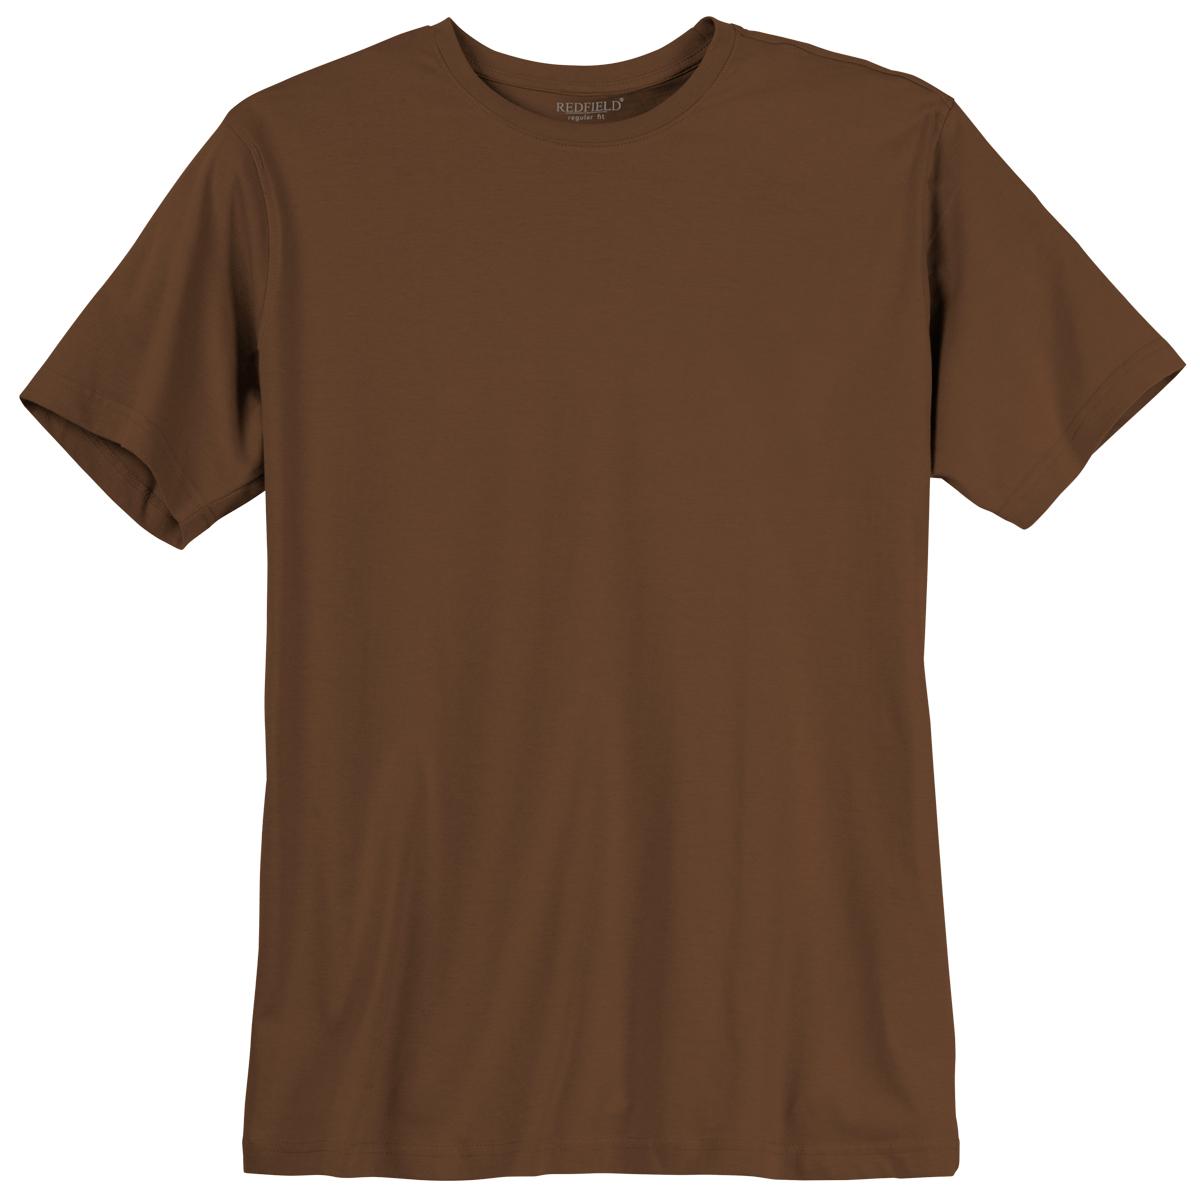 11dca4ec5a3ed Redfield Basic T-Shirt braun Übergröße 001